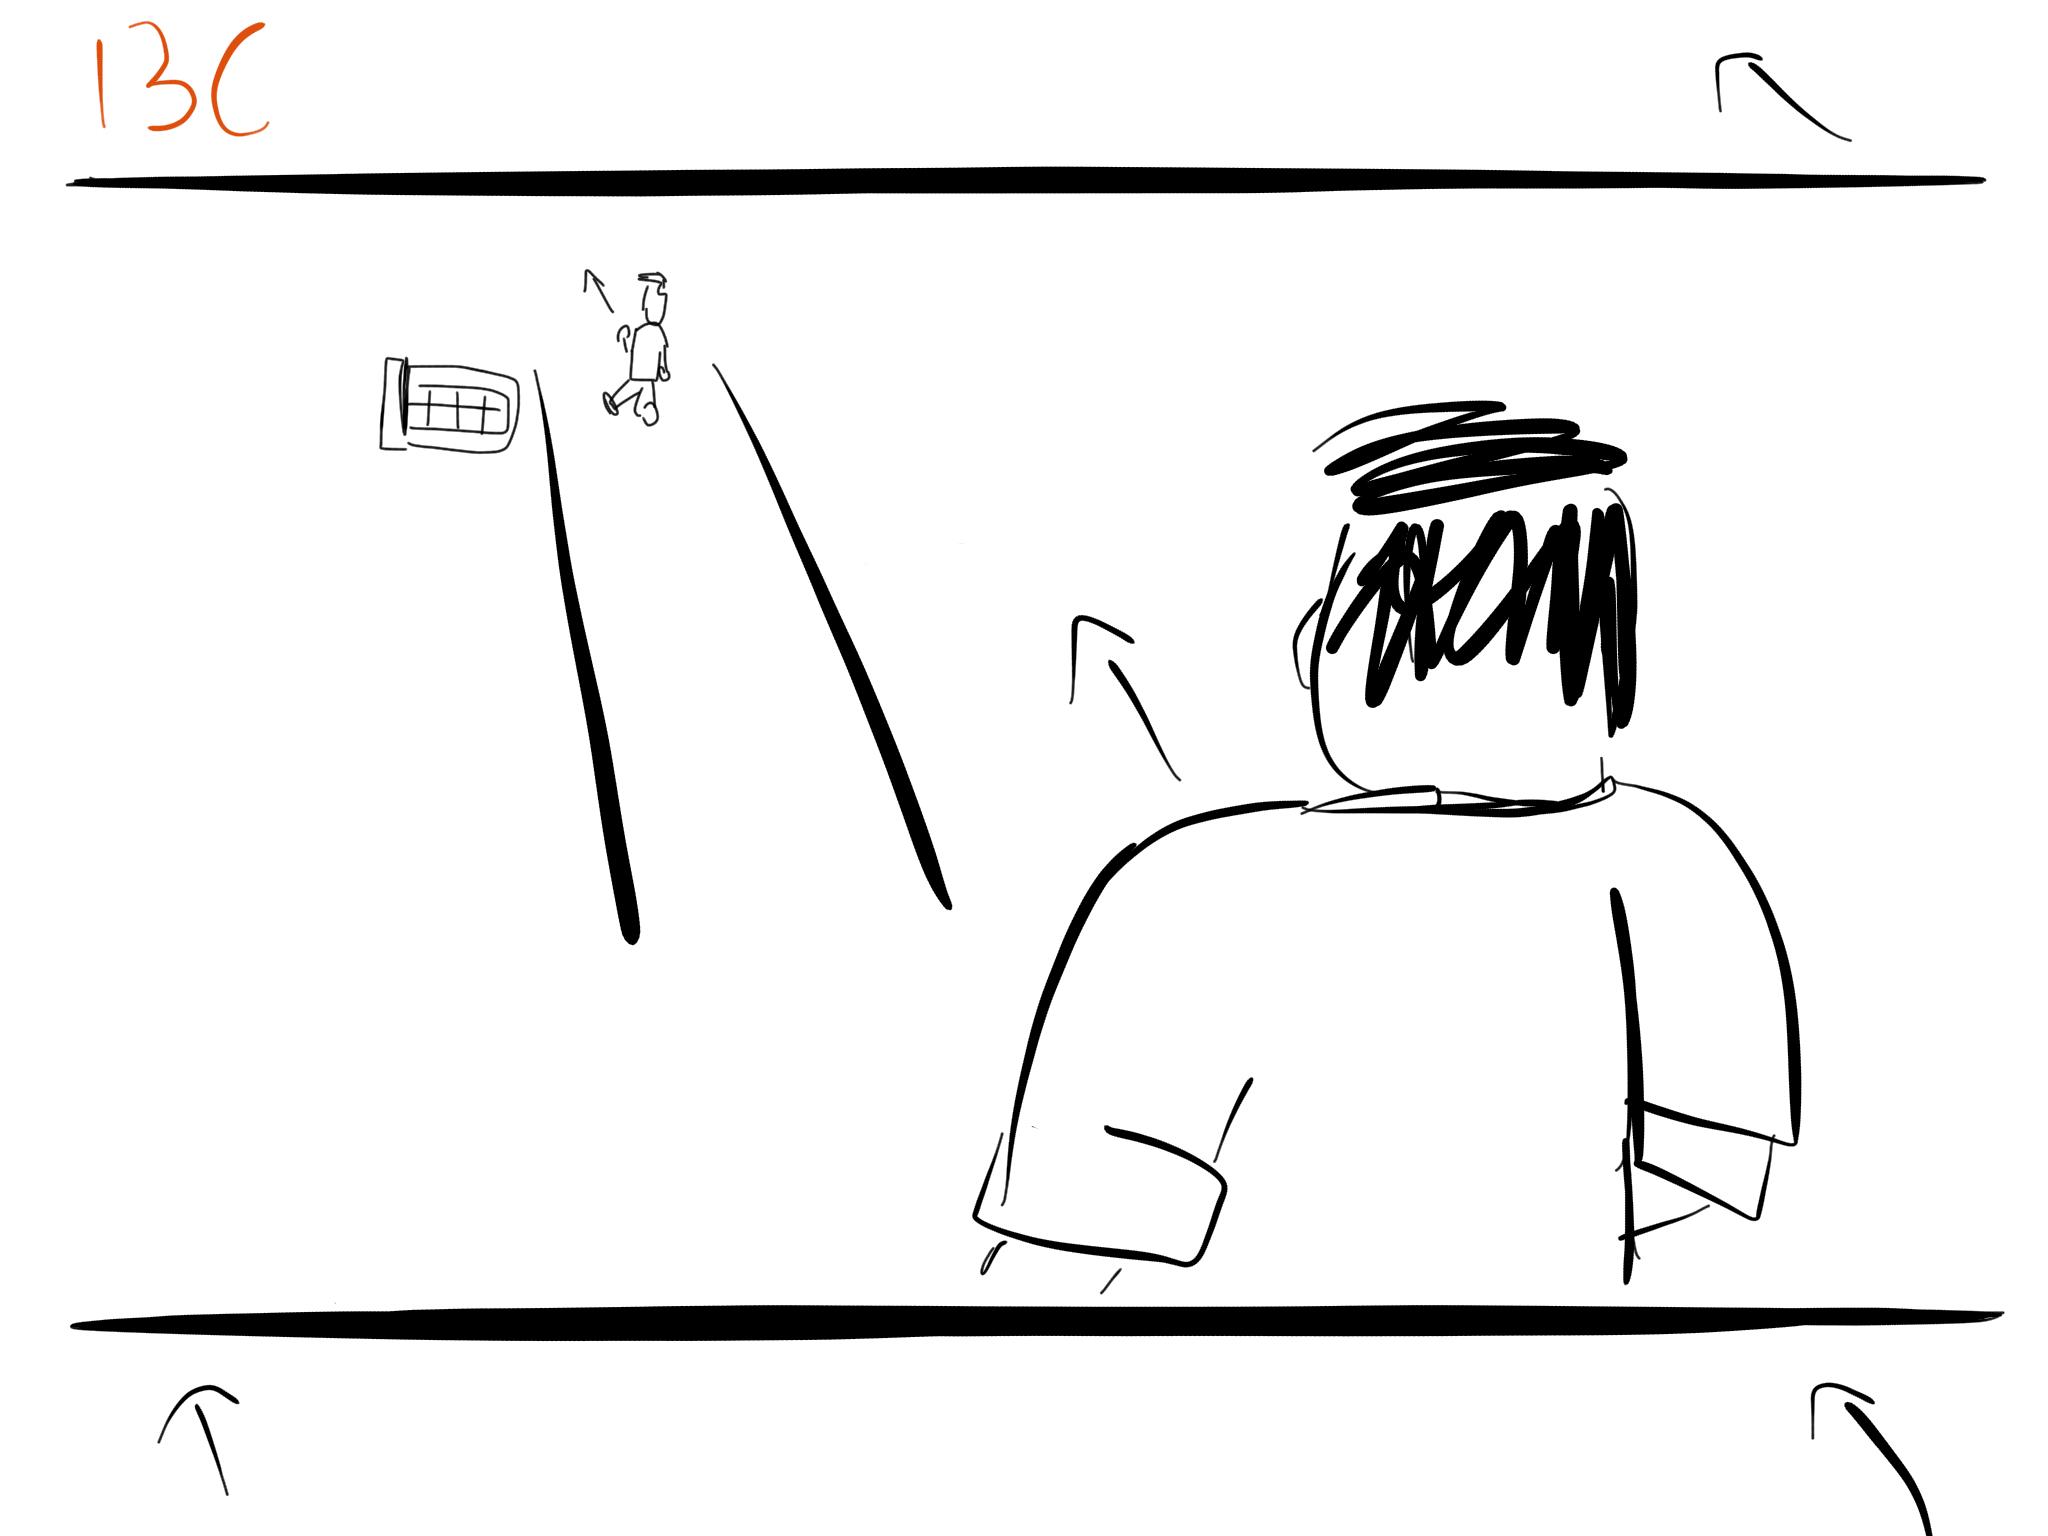 BDF_Storyboards_52.jpg